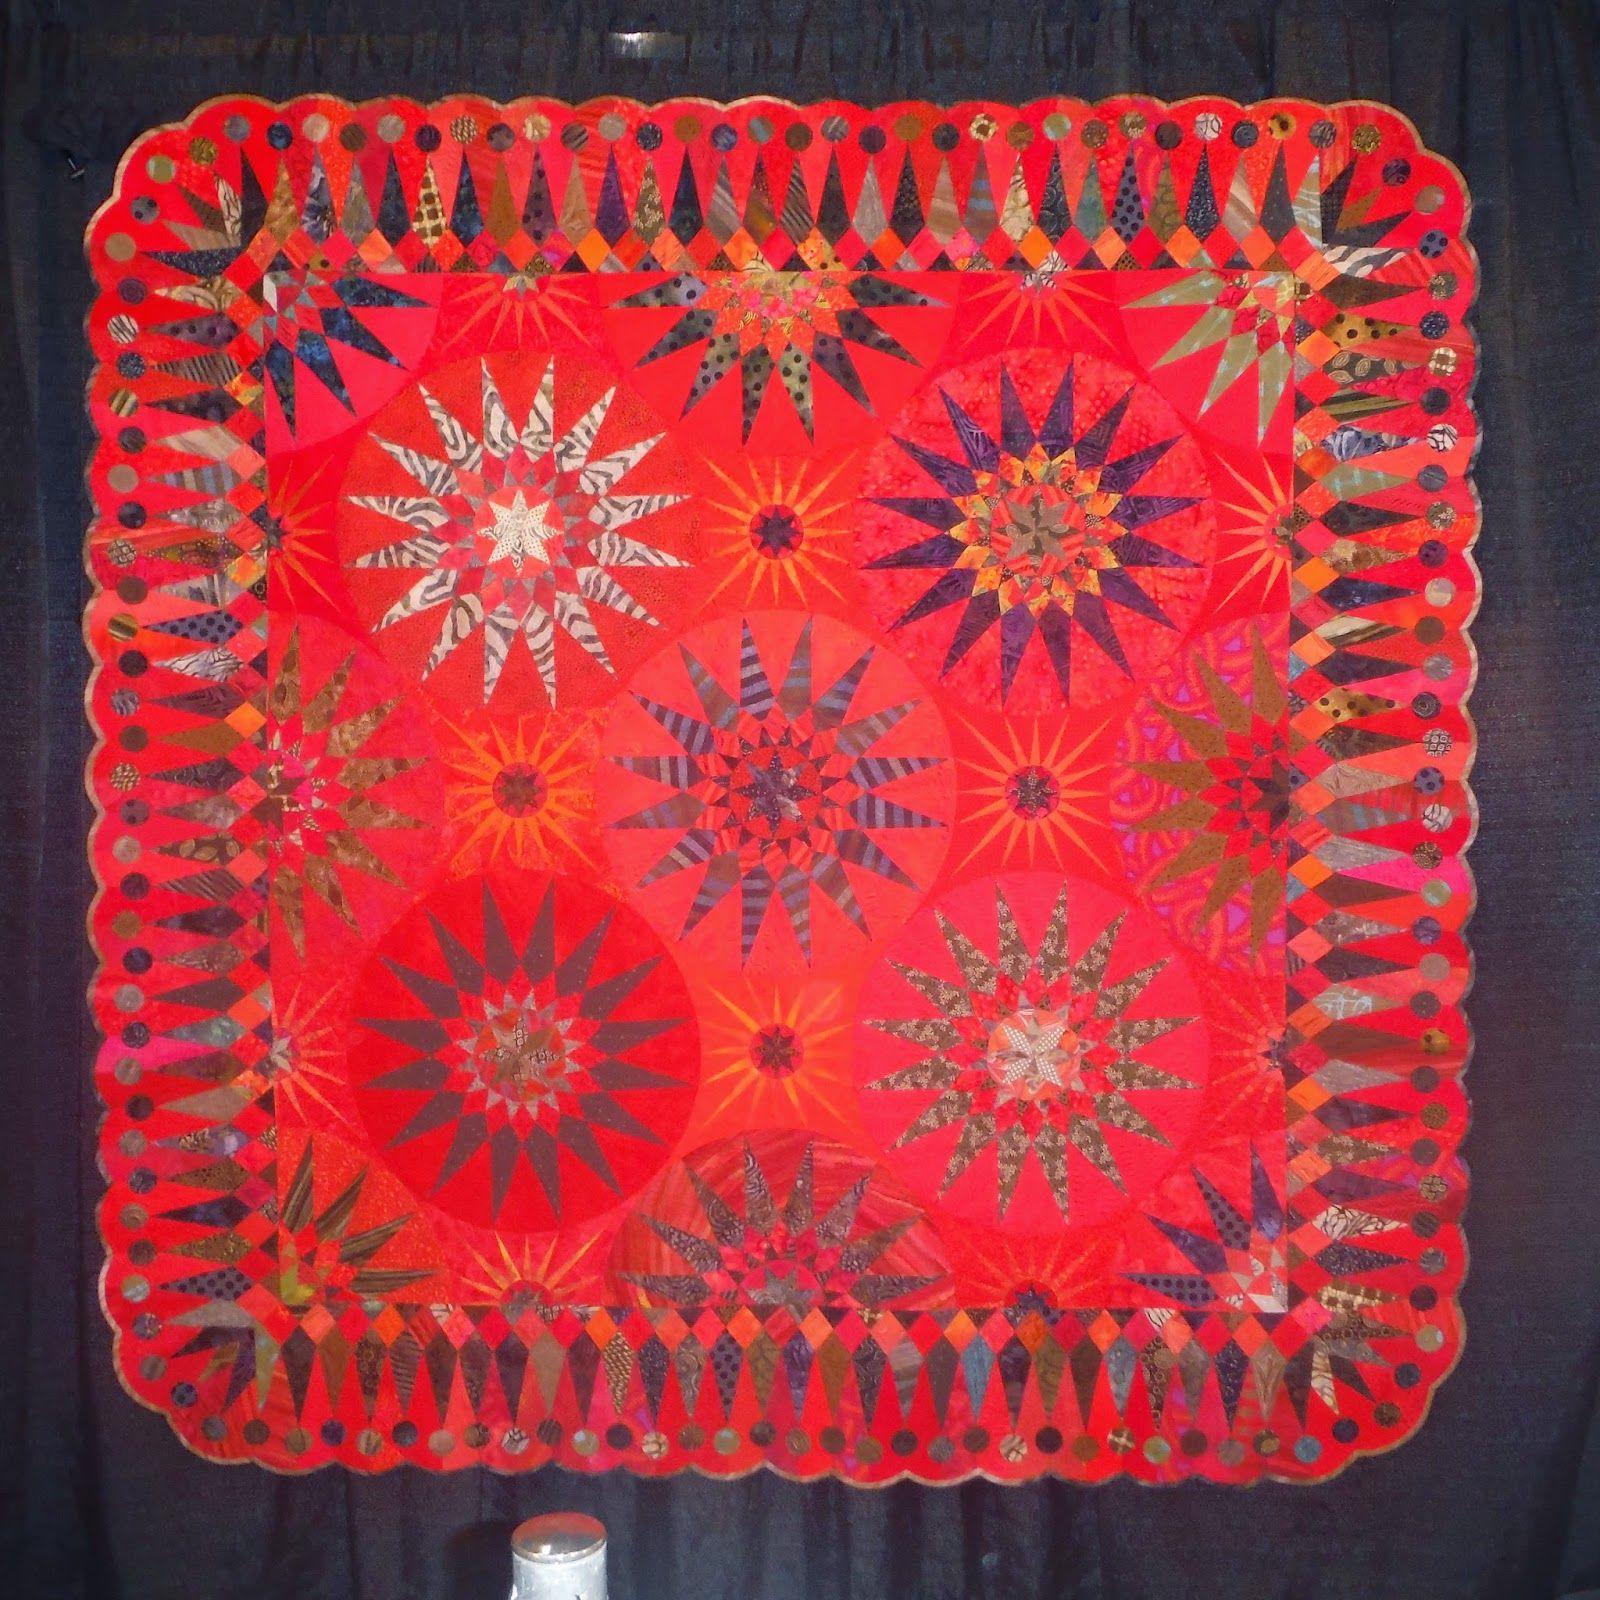 Quilt by Karen Stone Pine Mountain Quilt Studio